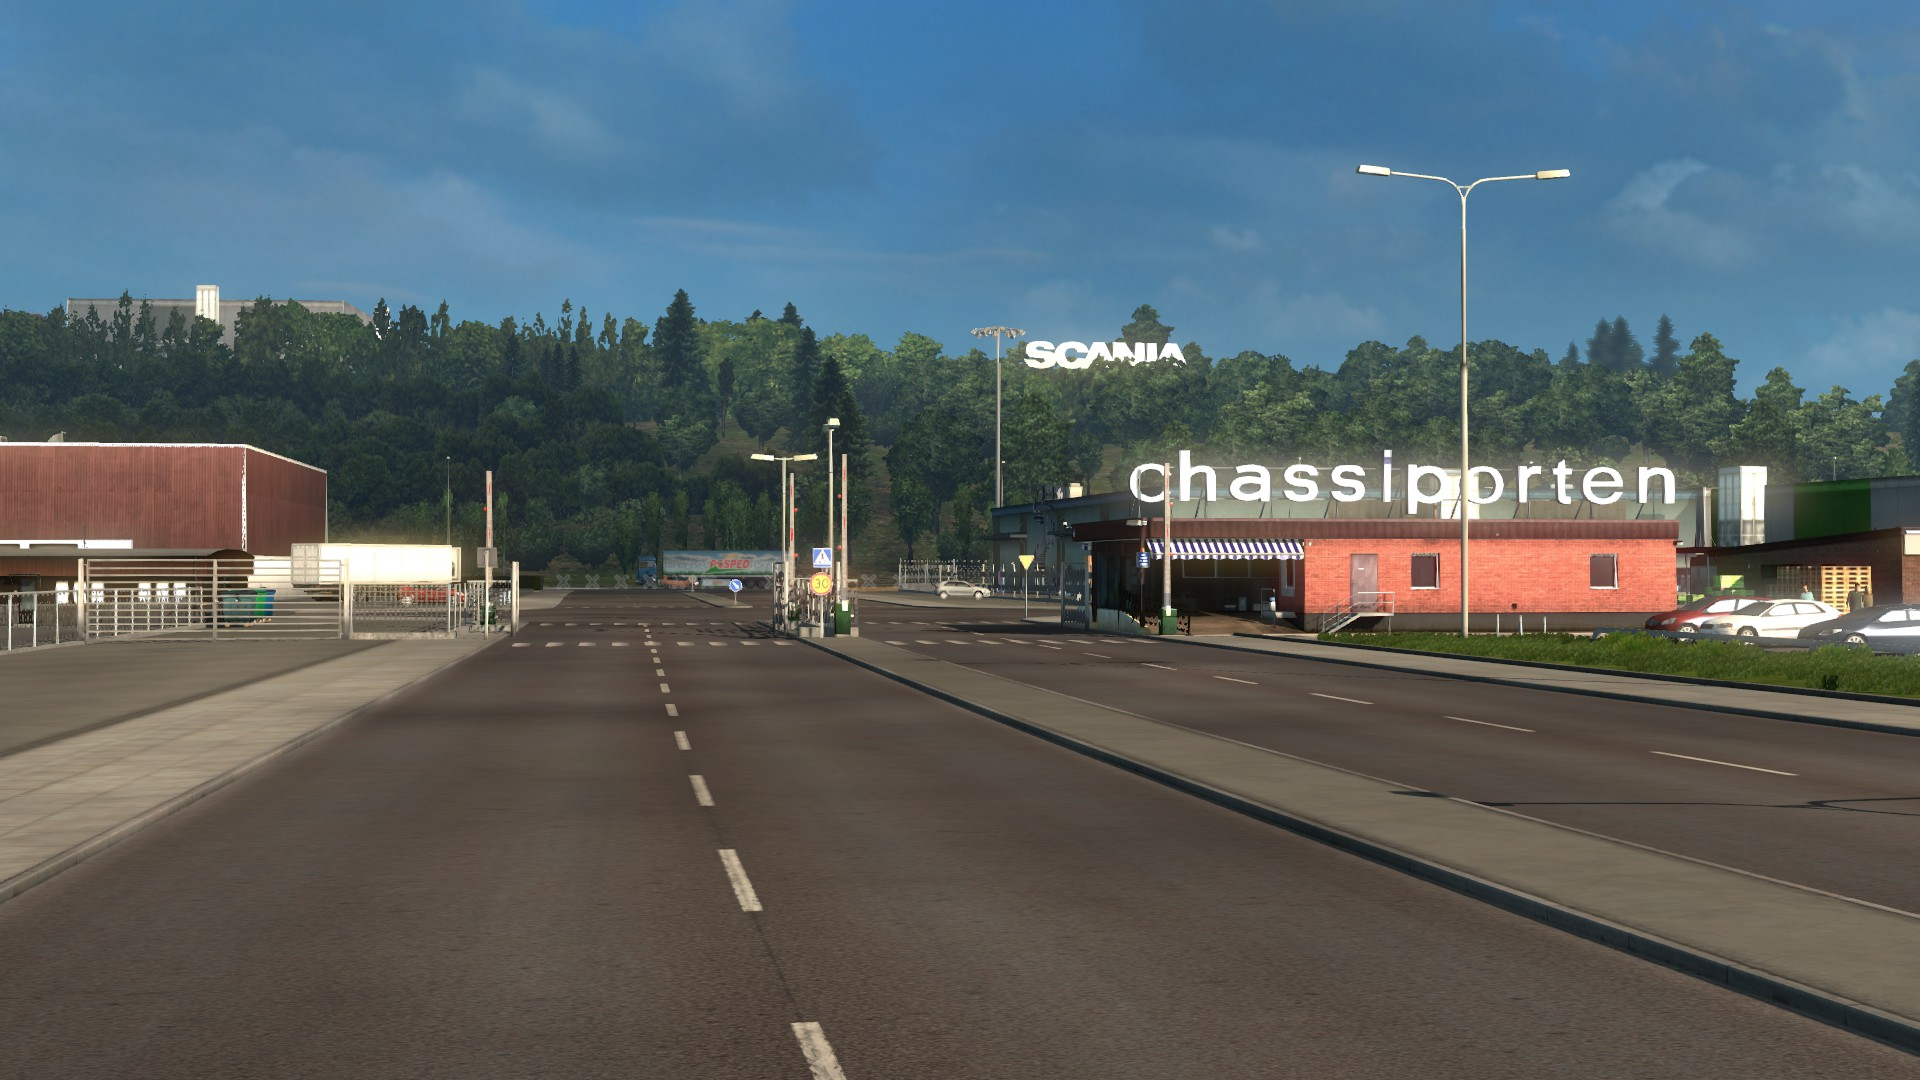 Volvo Dealerships In California >> Scania (logistics) | Truck Simulator Wiki | FANDOM powered by Wikia